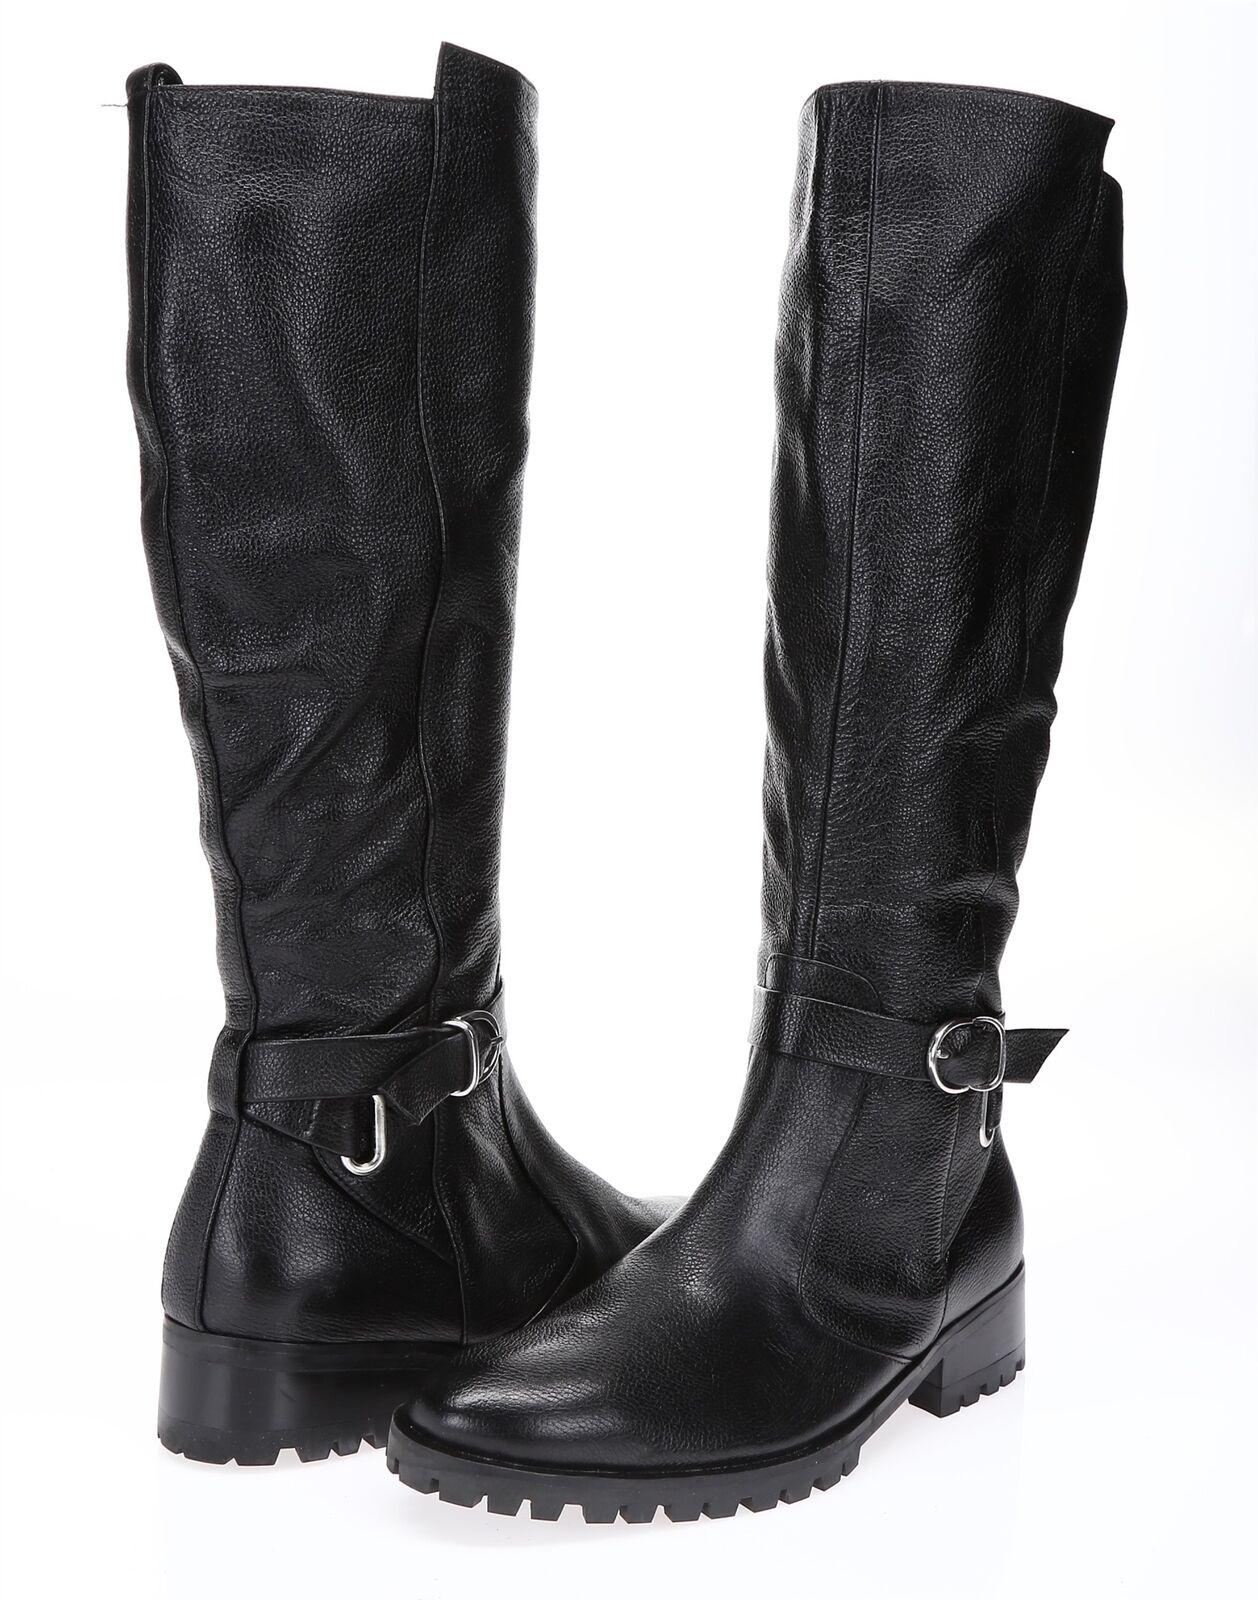 TESORI Womens 'Valencia' Black Leather Knee High Sz 6 M Boots 217808